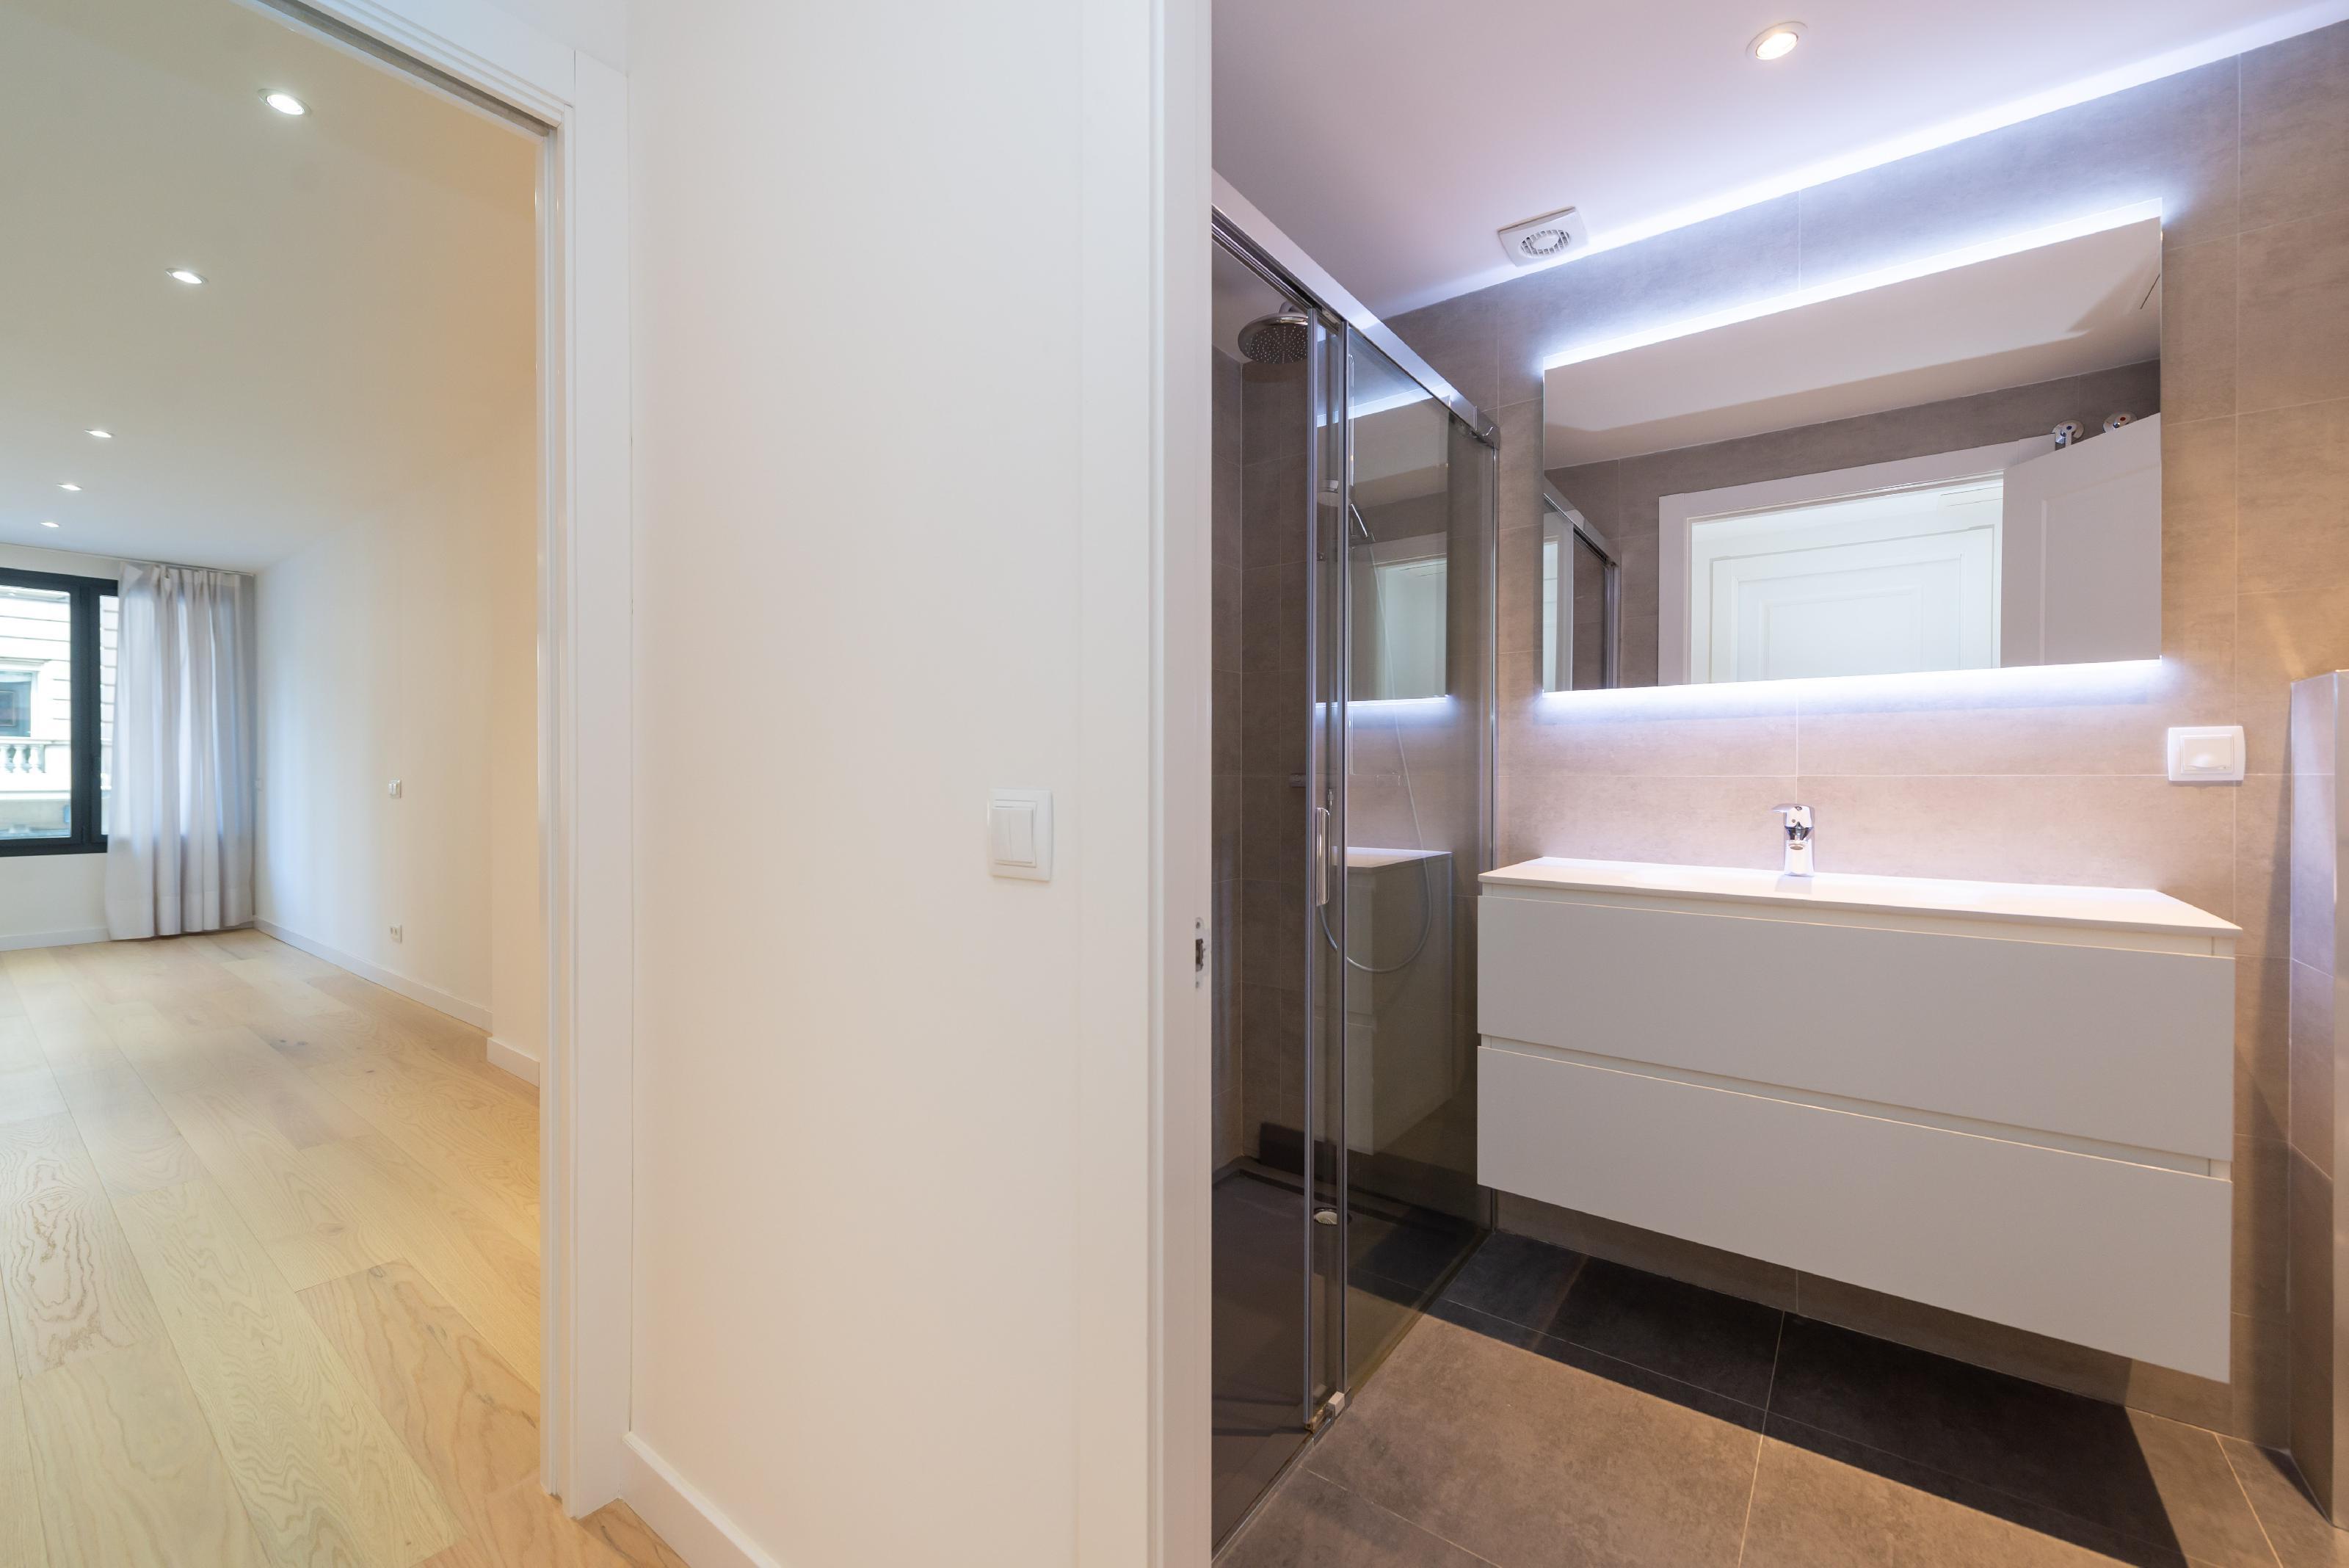 245231 Flat for sale in Sarrià-Sant Gervasi, Sant Gervasi-Galvany 16